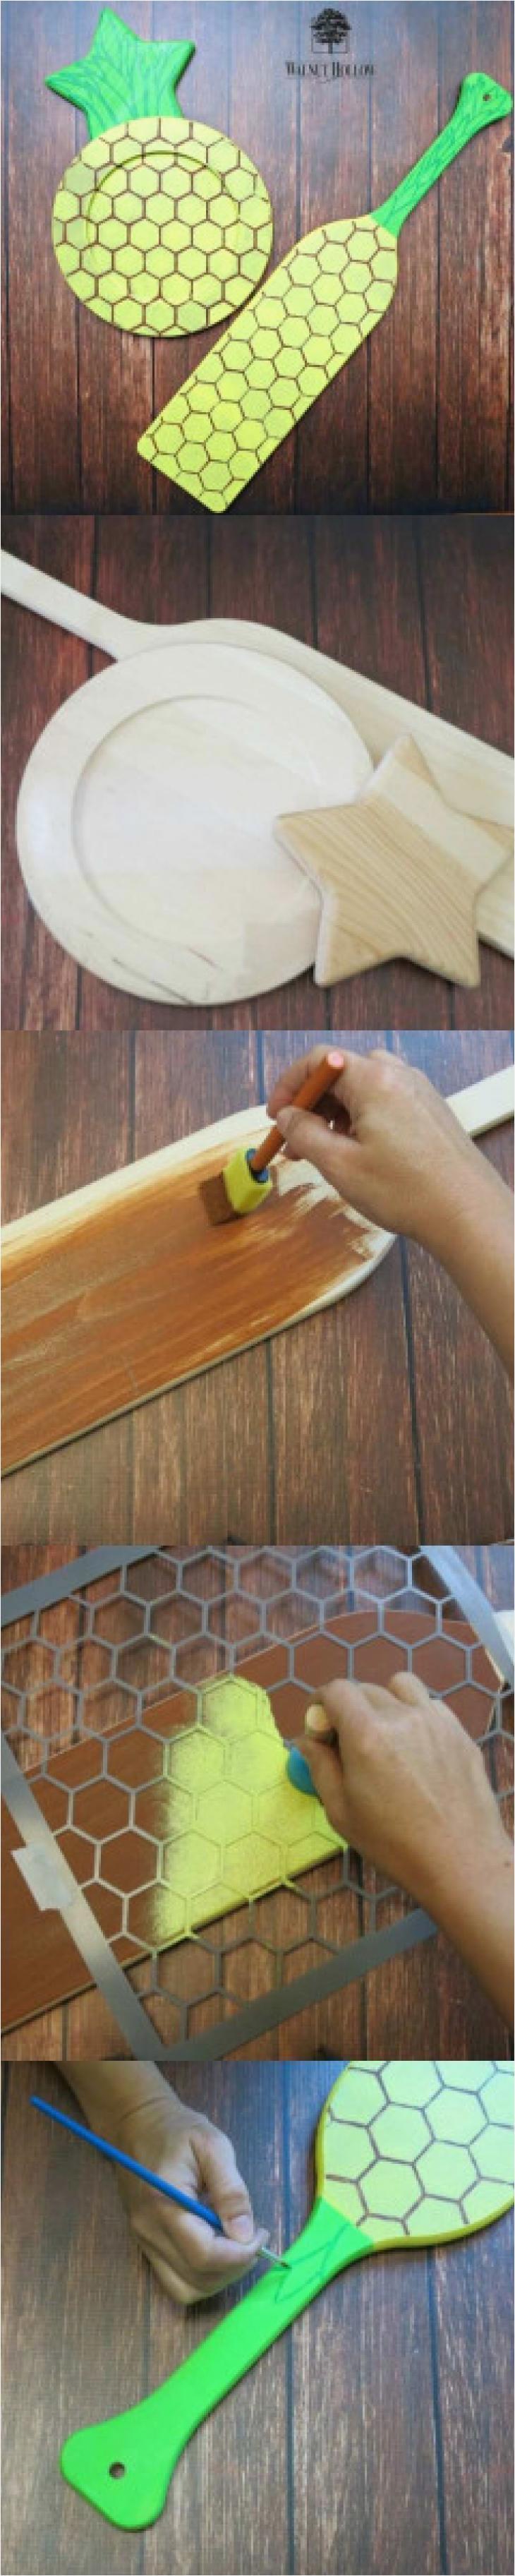 6 hardwood flooring of smith flooring elegant floor and decor houston 37 inspirational in smith flooring new 37 great outdoor wood flooring graphic